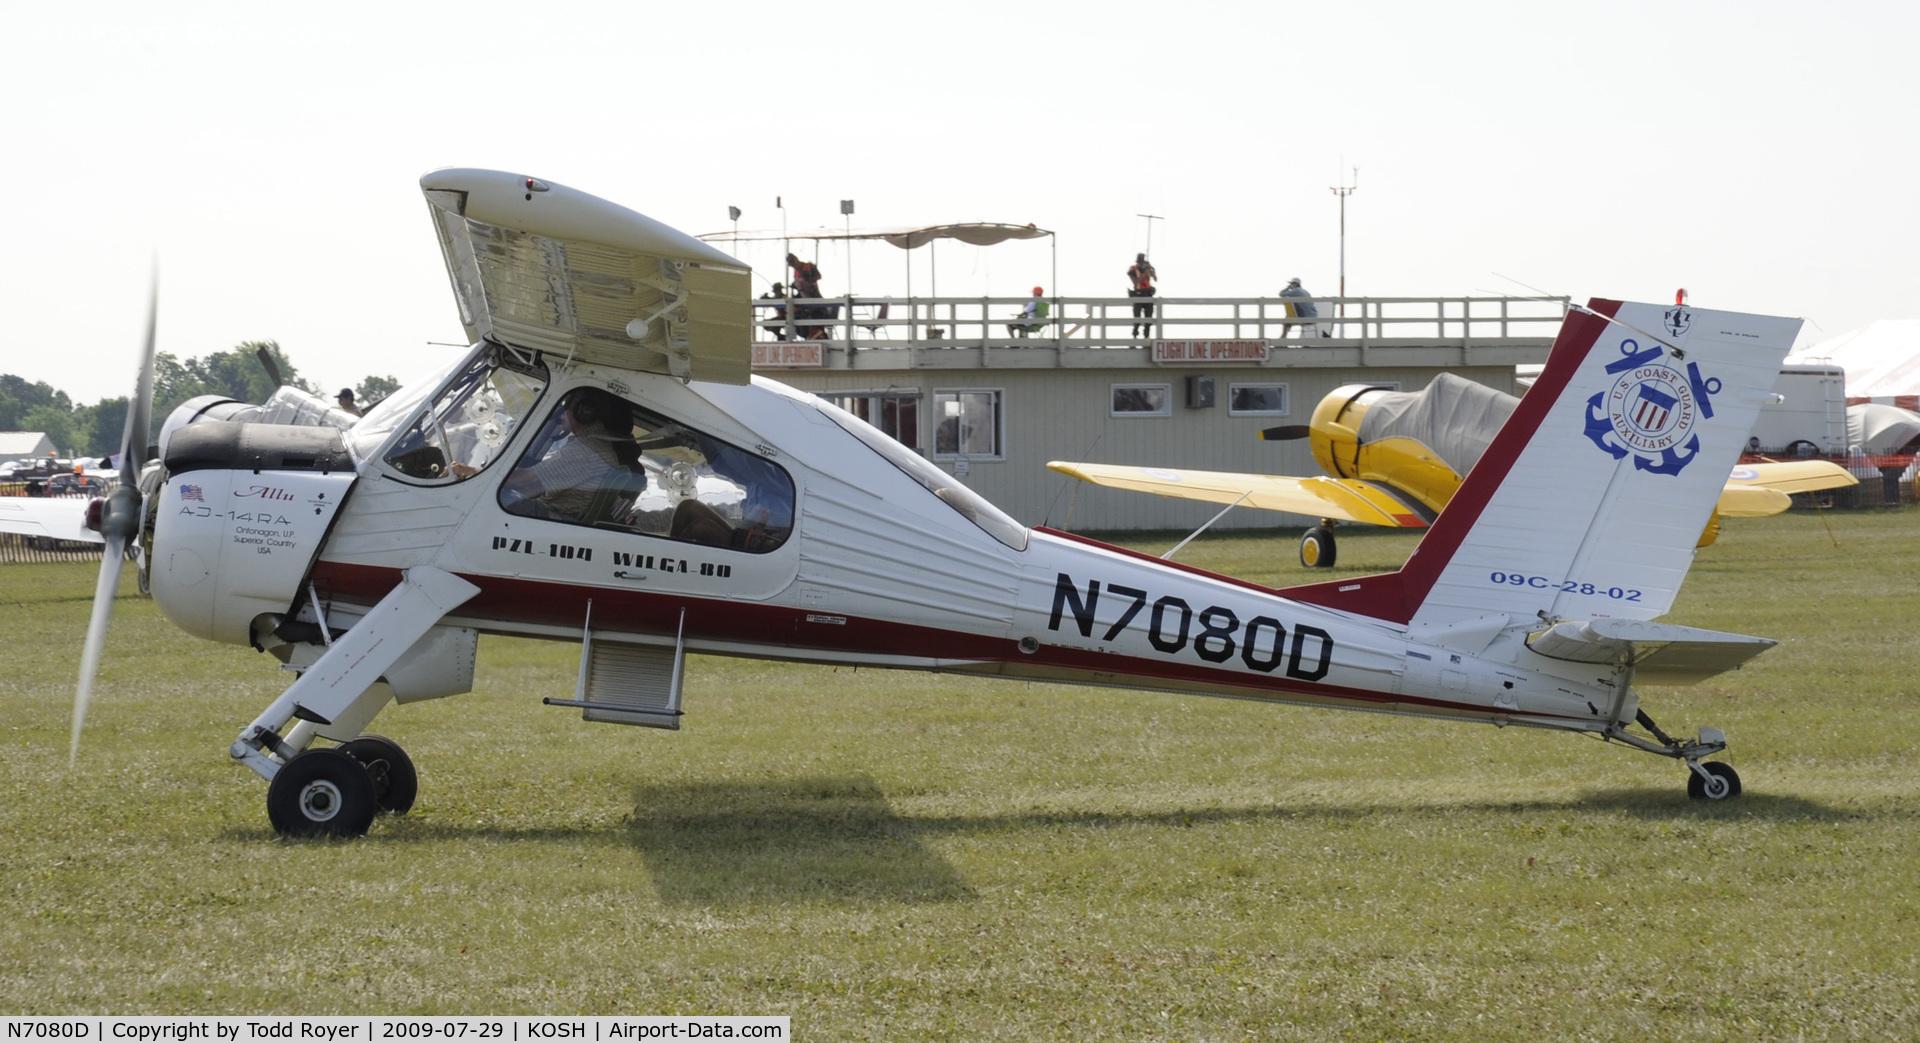 N7080D, 1993 PZL-Okecie PZL-104 Wilga 80 C/N CF21920935, EAA AIRVENTURE 2009